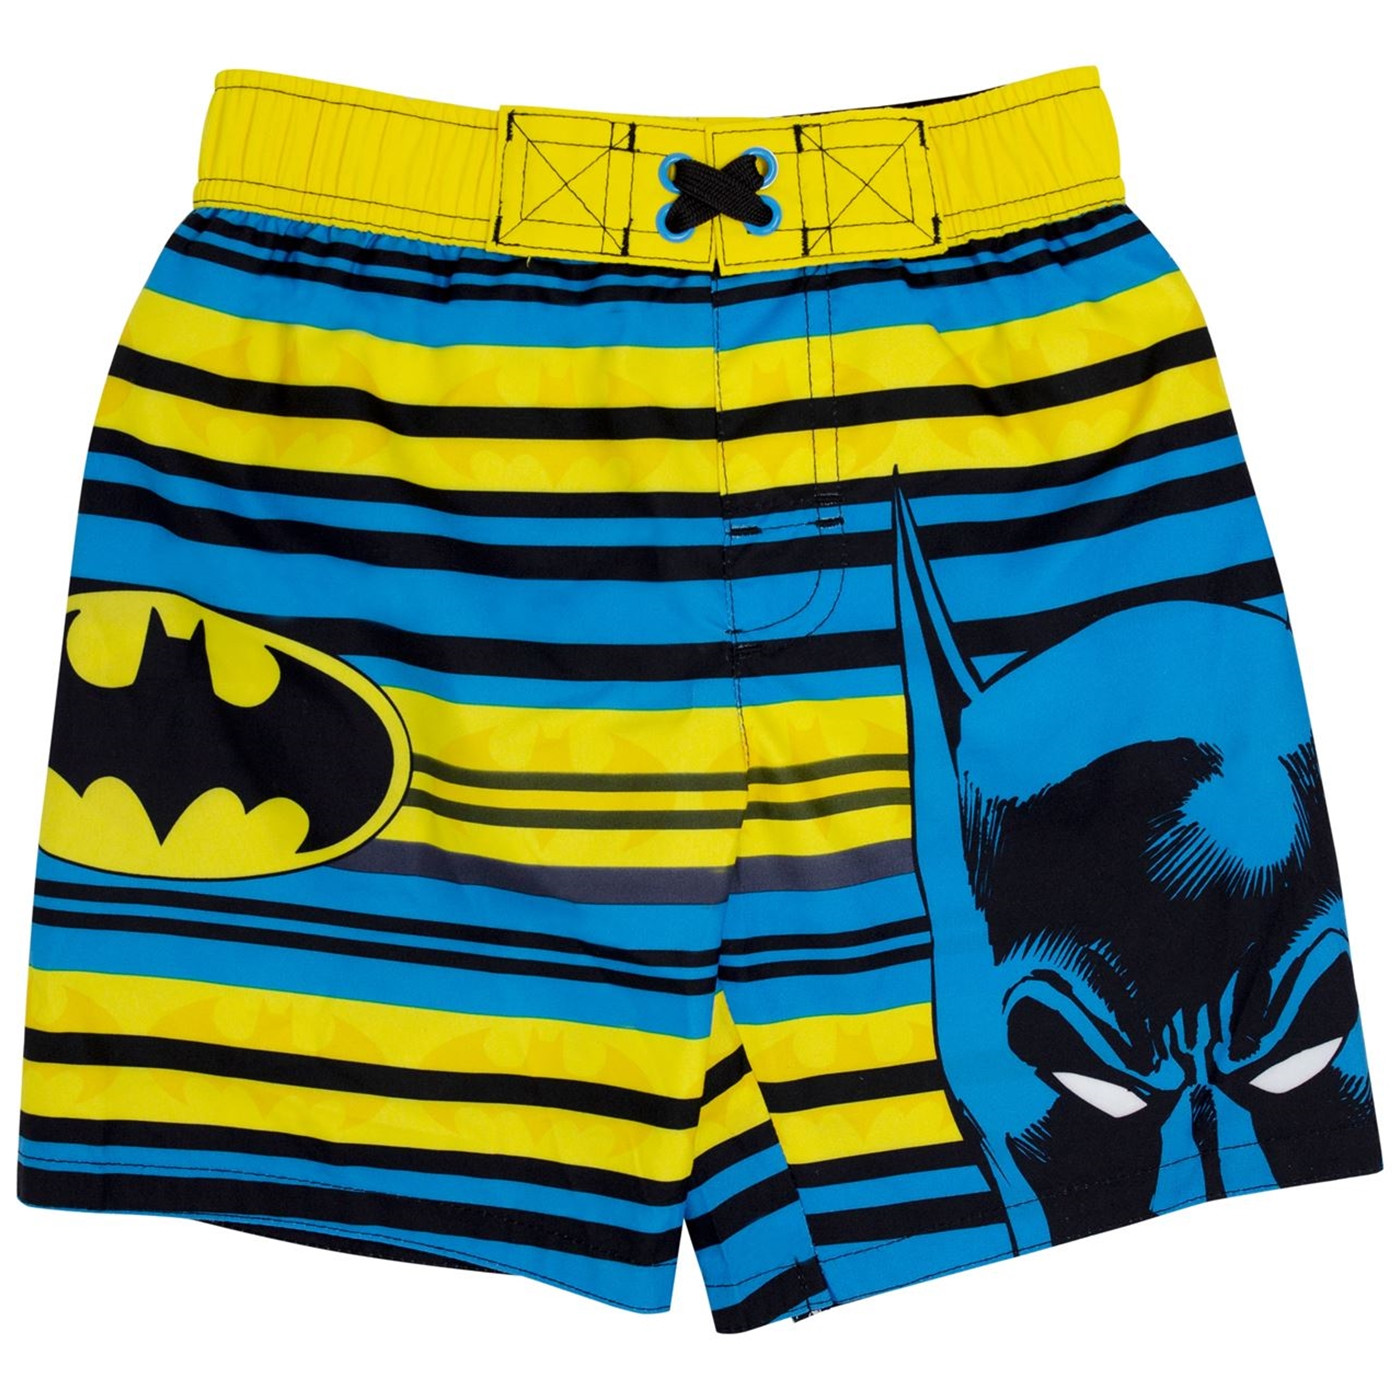 Batman Toddler Swim Trunks